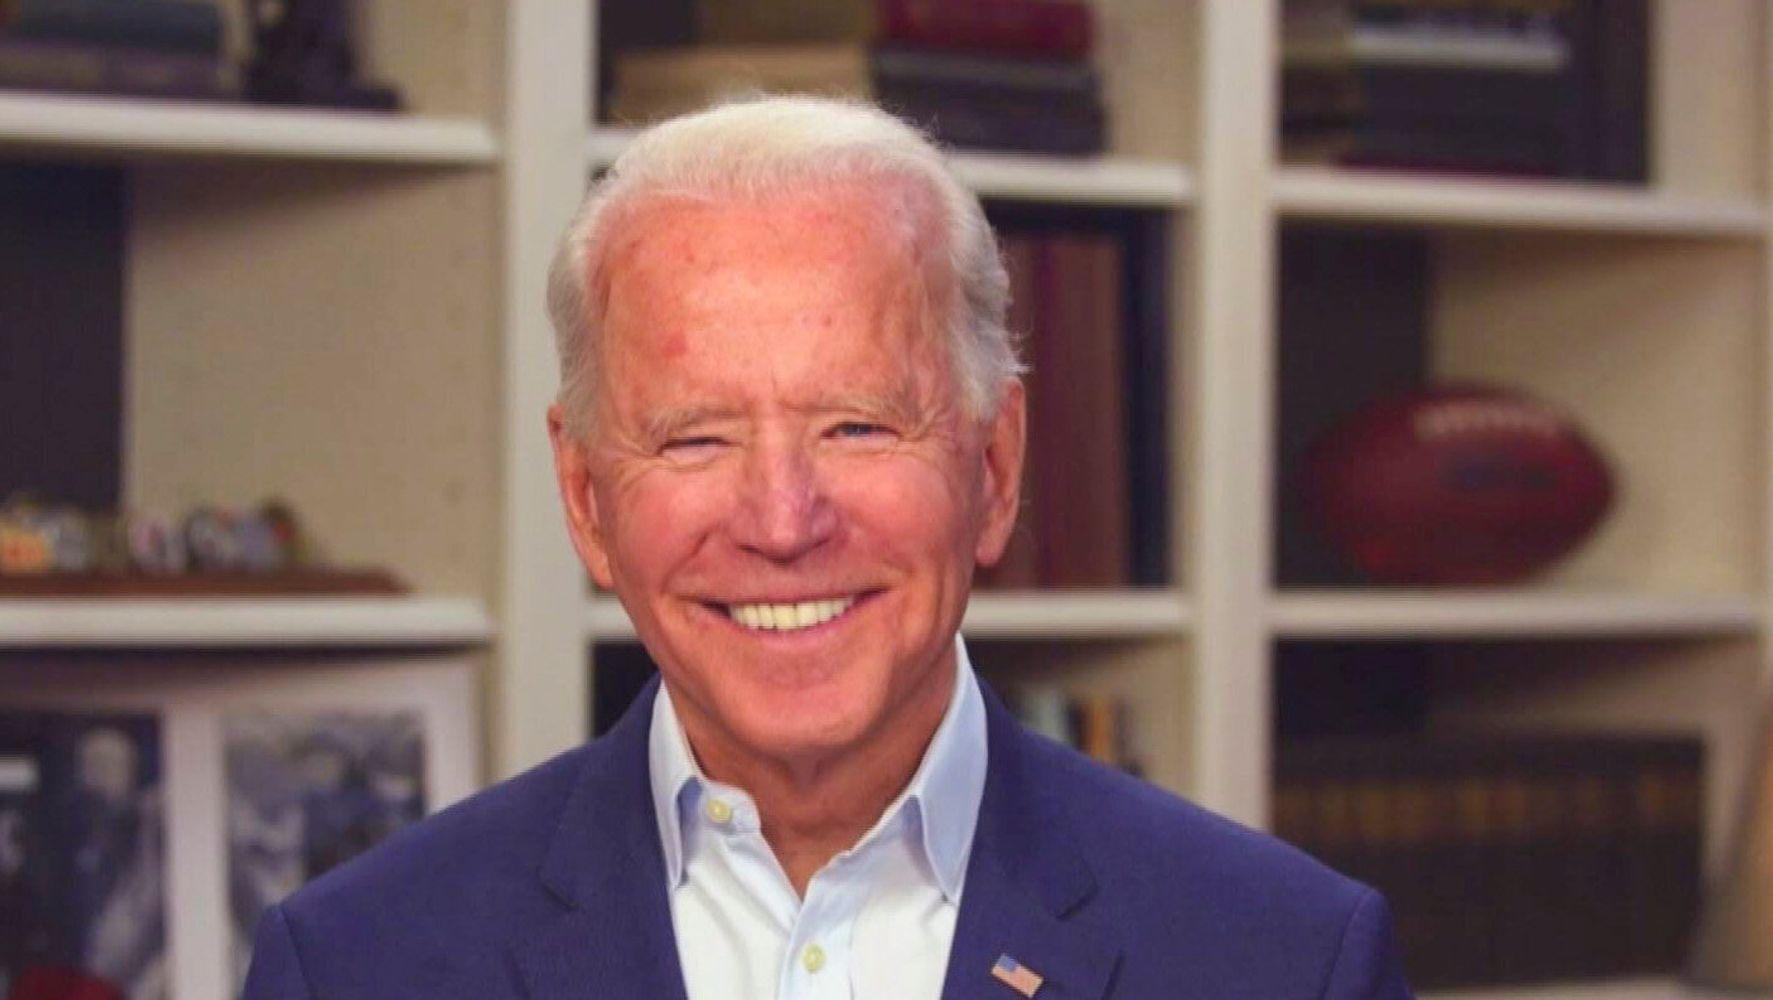 Joe Biden's Campaign Returns Louis C.K.'s Donation